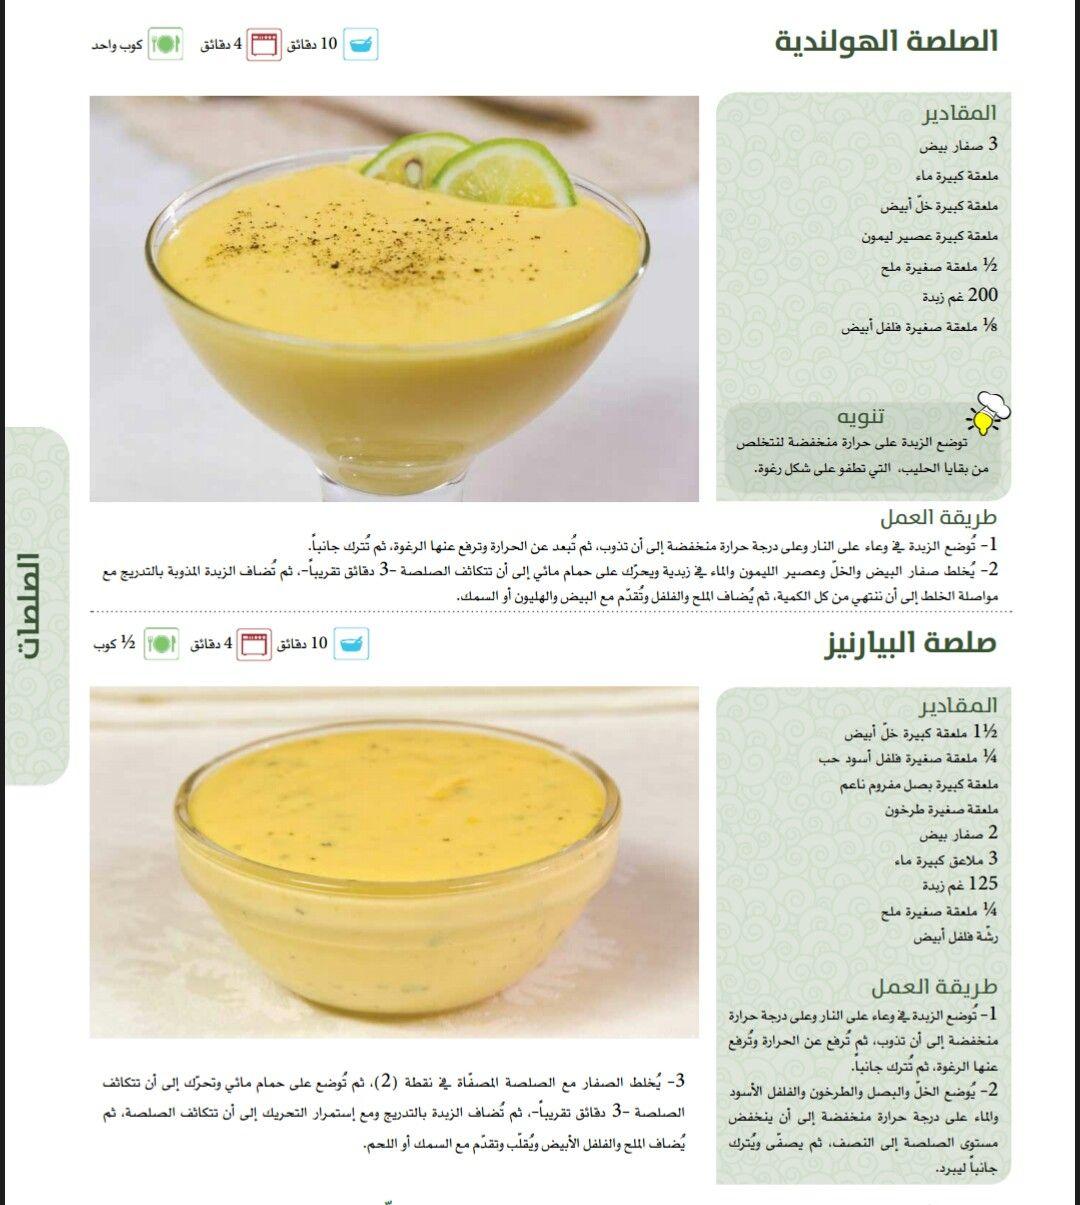 Pin By Nooran On بهارات وصوصات Food Food And Drink Desserts